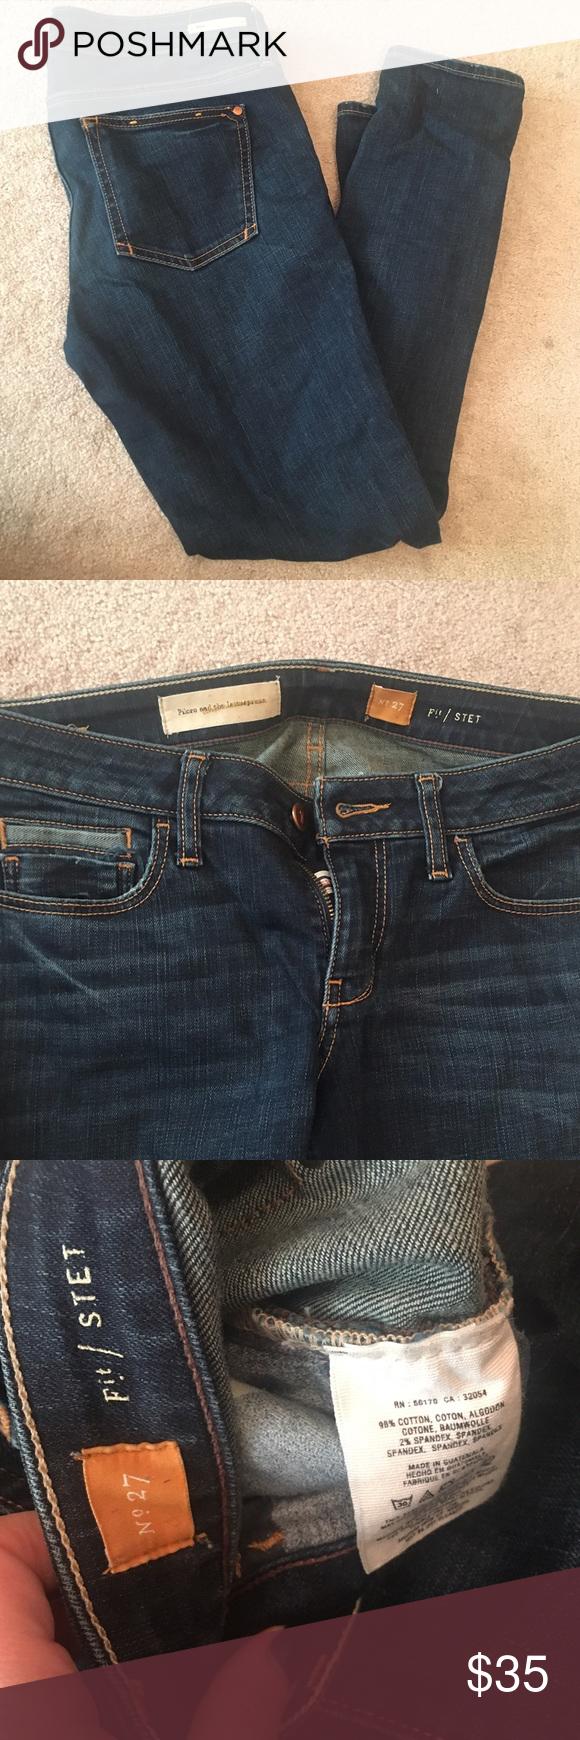 Anthropologie jean Pilcro straight leg jean. Size 27. Worn twice Anthropologie Jeans